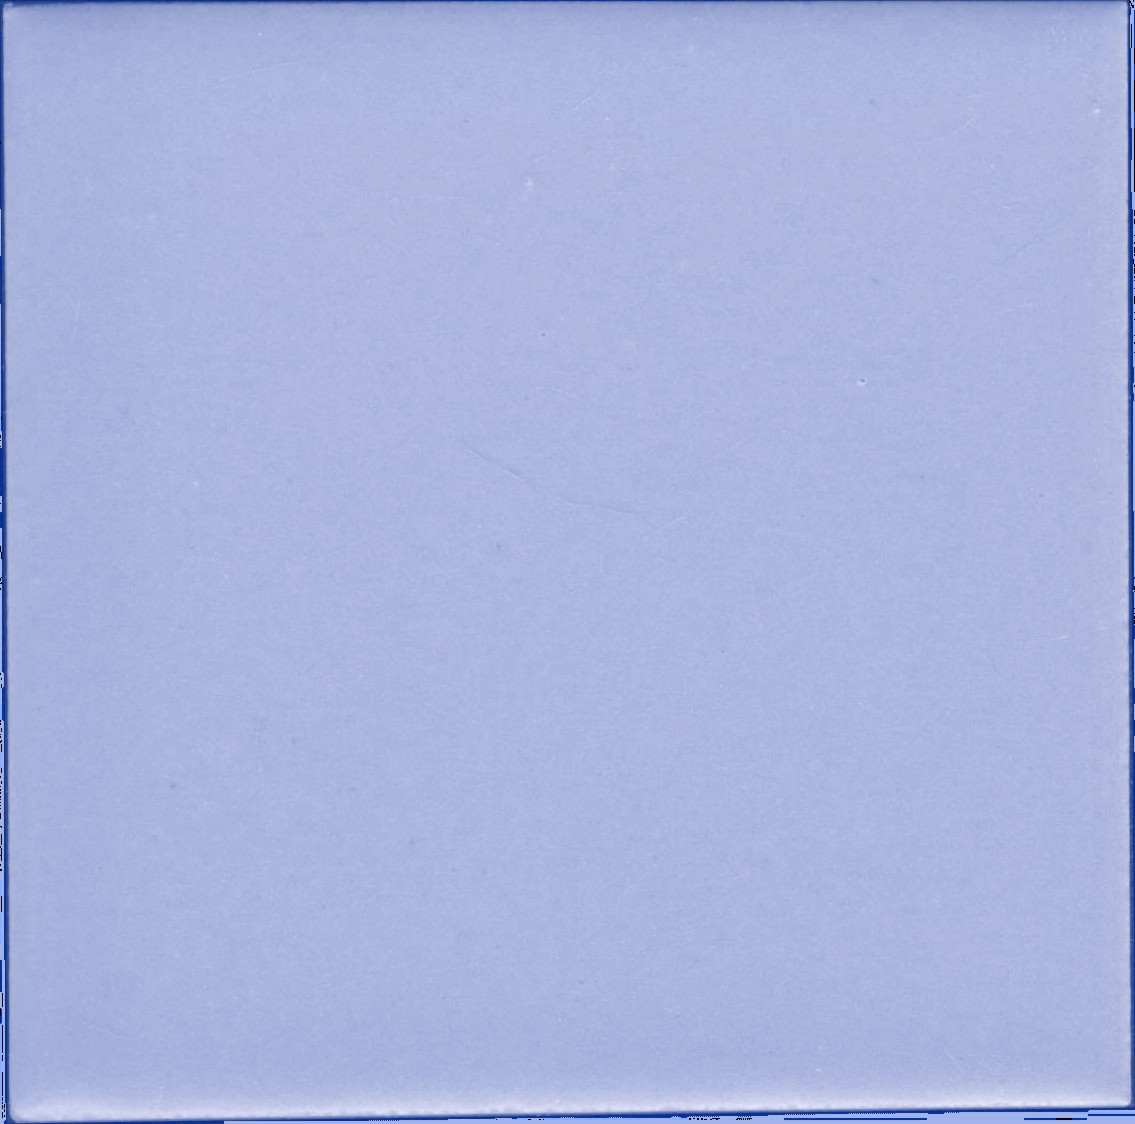 "Aqua  -  2"" Porcelain picture"